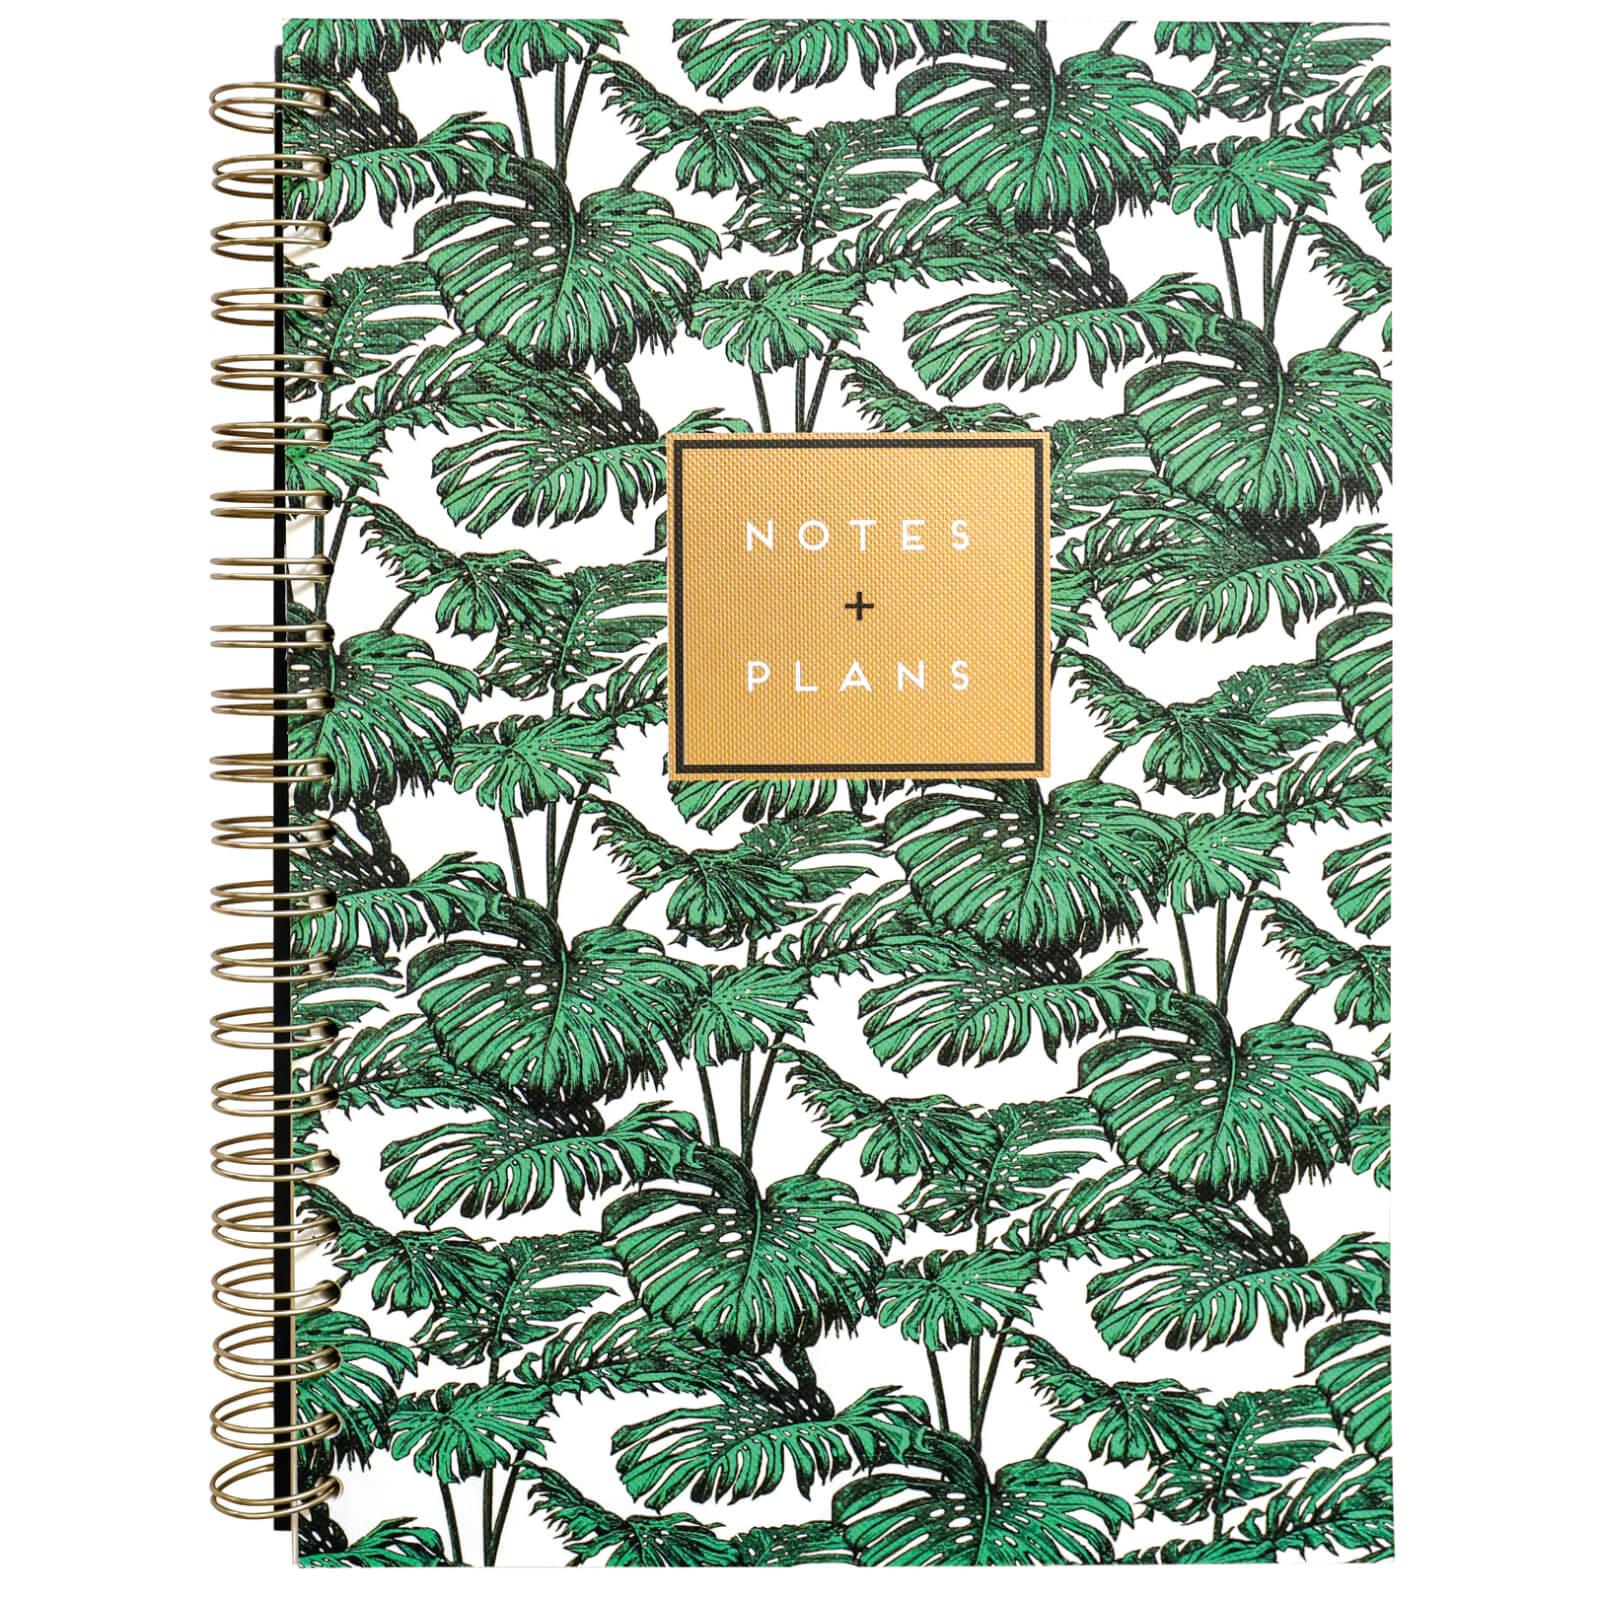 Scott Alice Scott Note and Plans A4 Wiro Journal